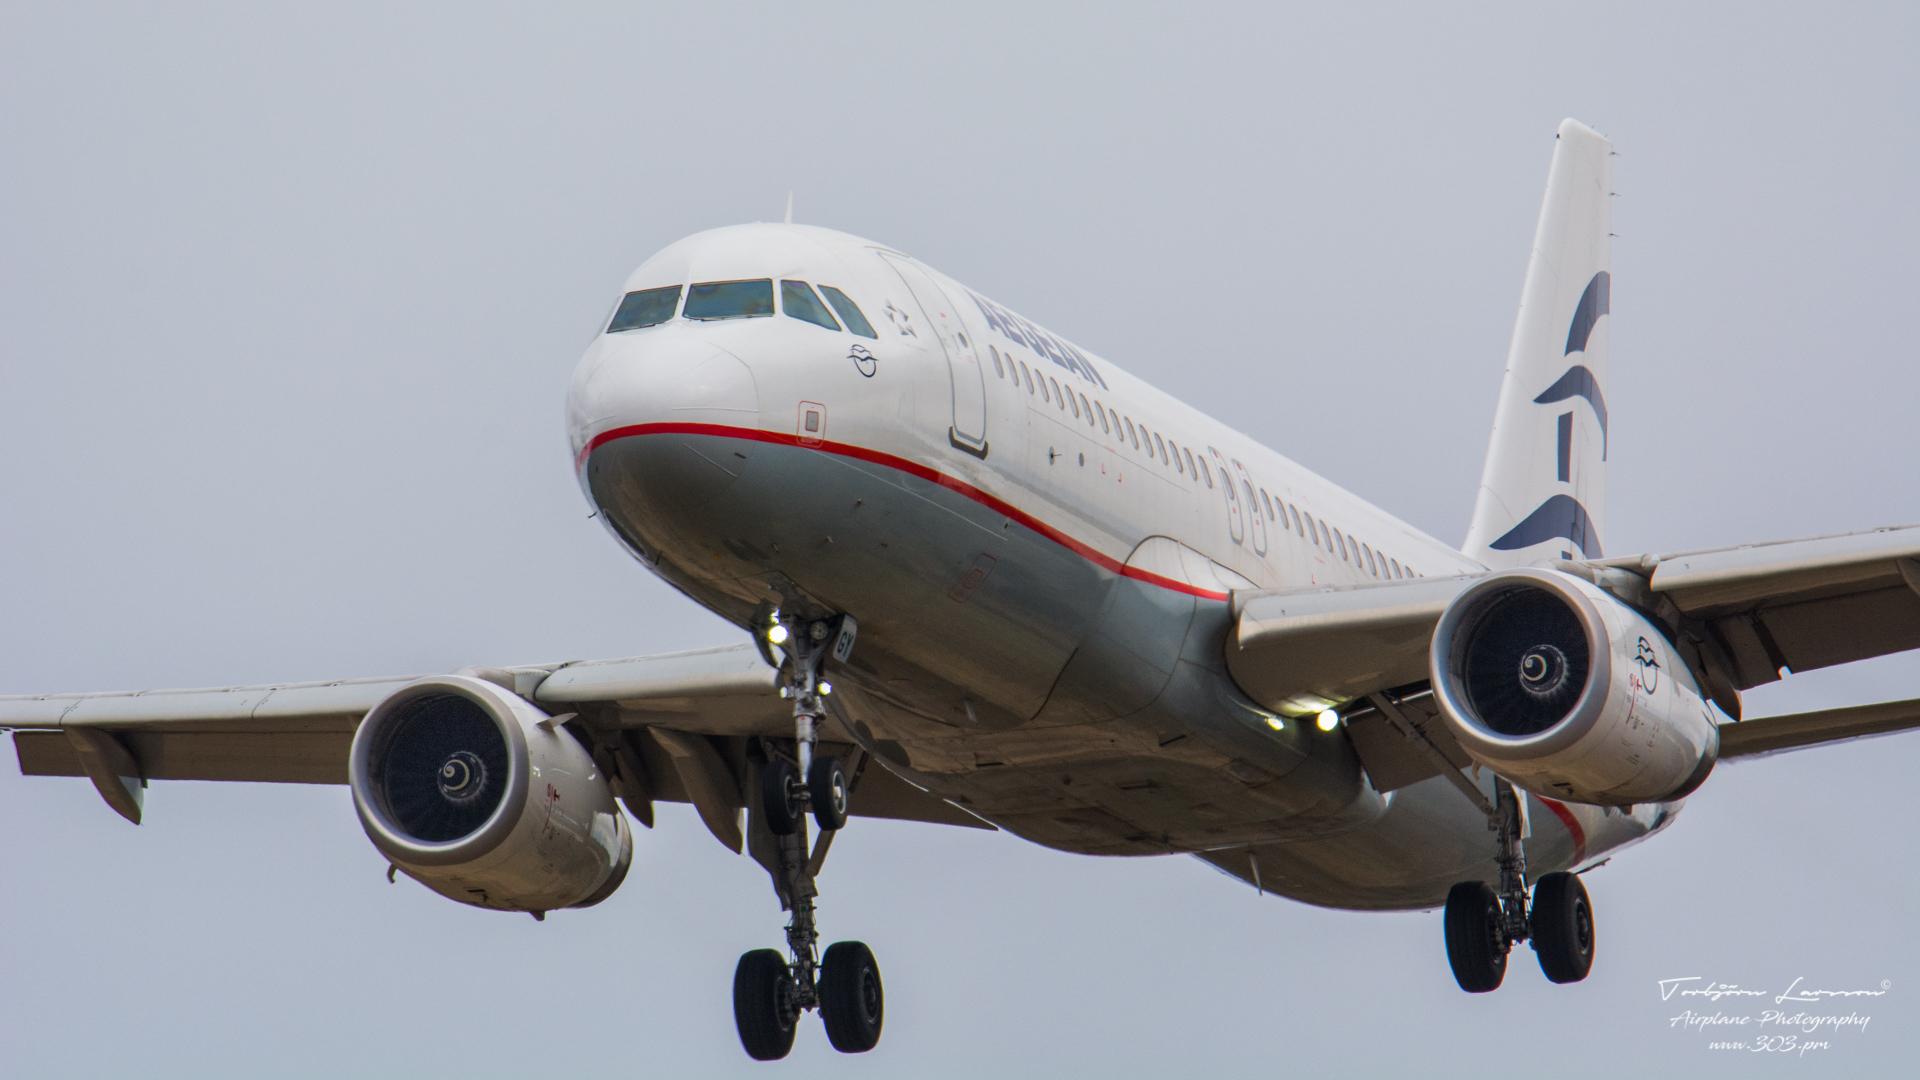 TBE_6694-Airbus A320-232(SL) - Aegean Airlines (SX-DGY)